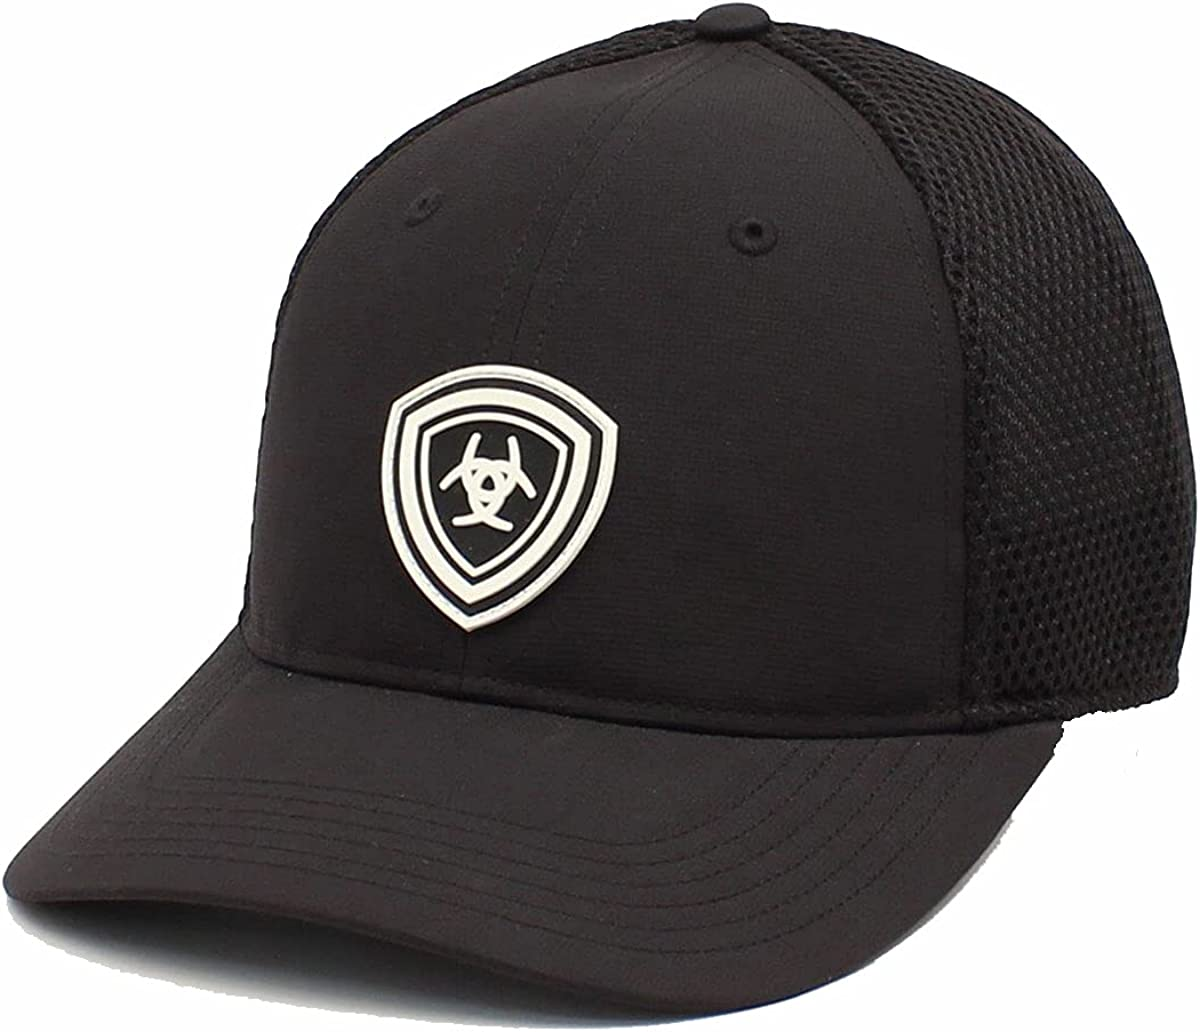 ARIAT Men's Rubber Shield Adjustable Cap, Black